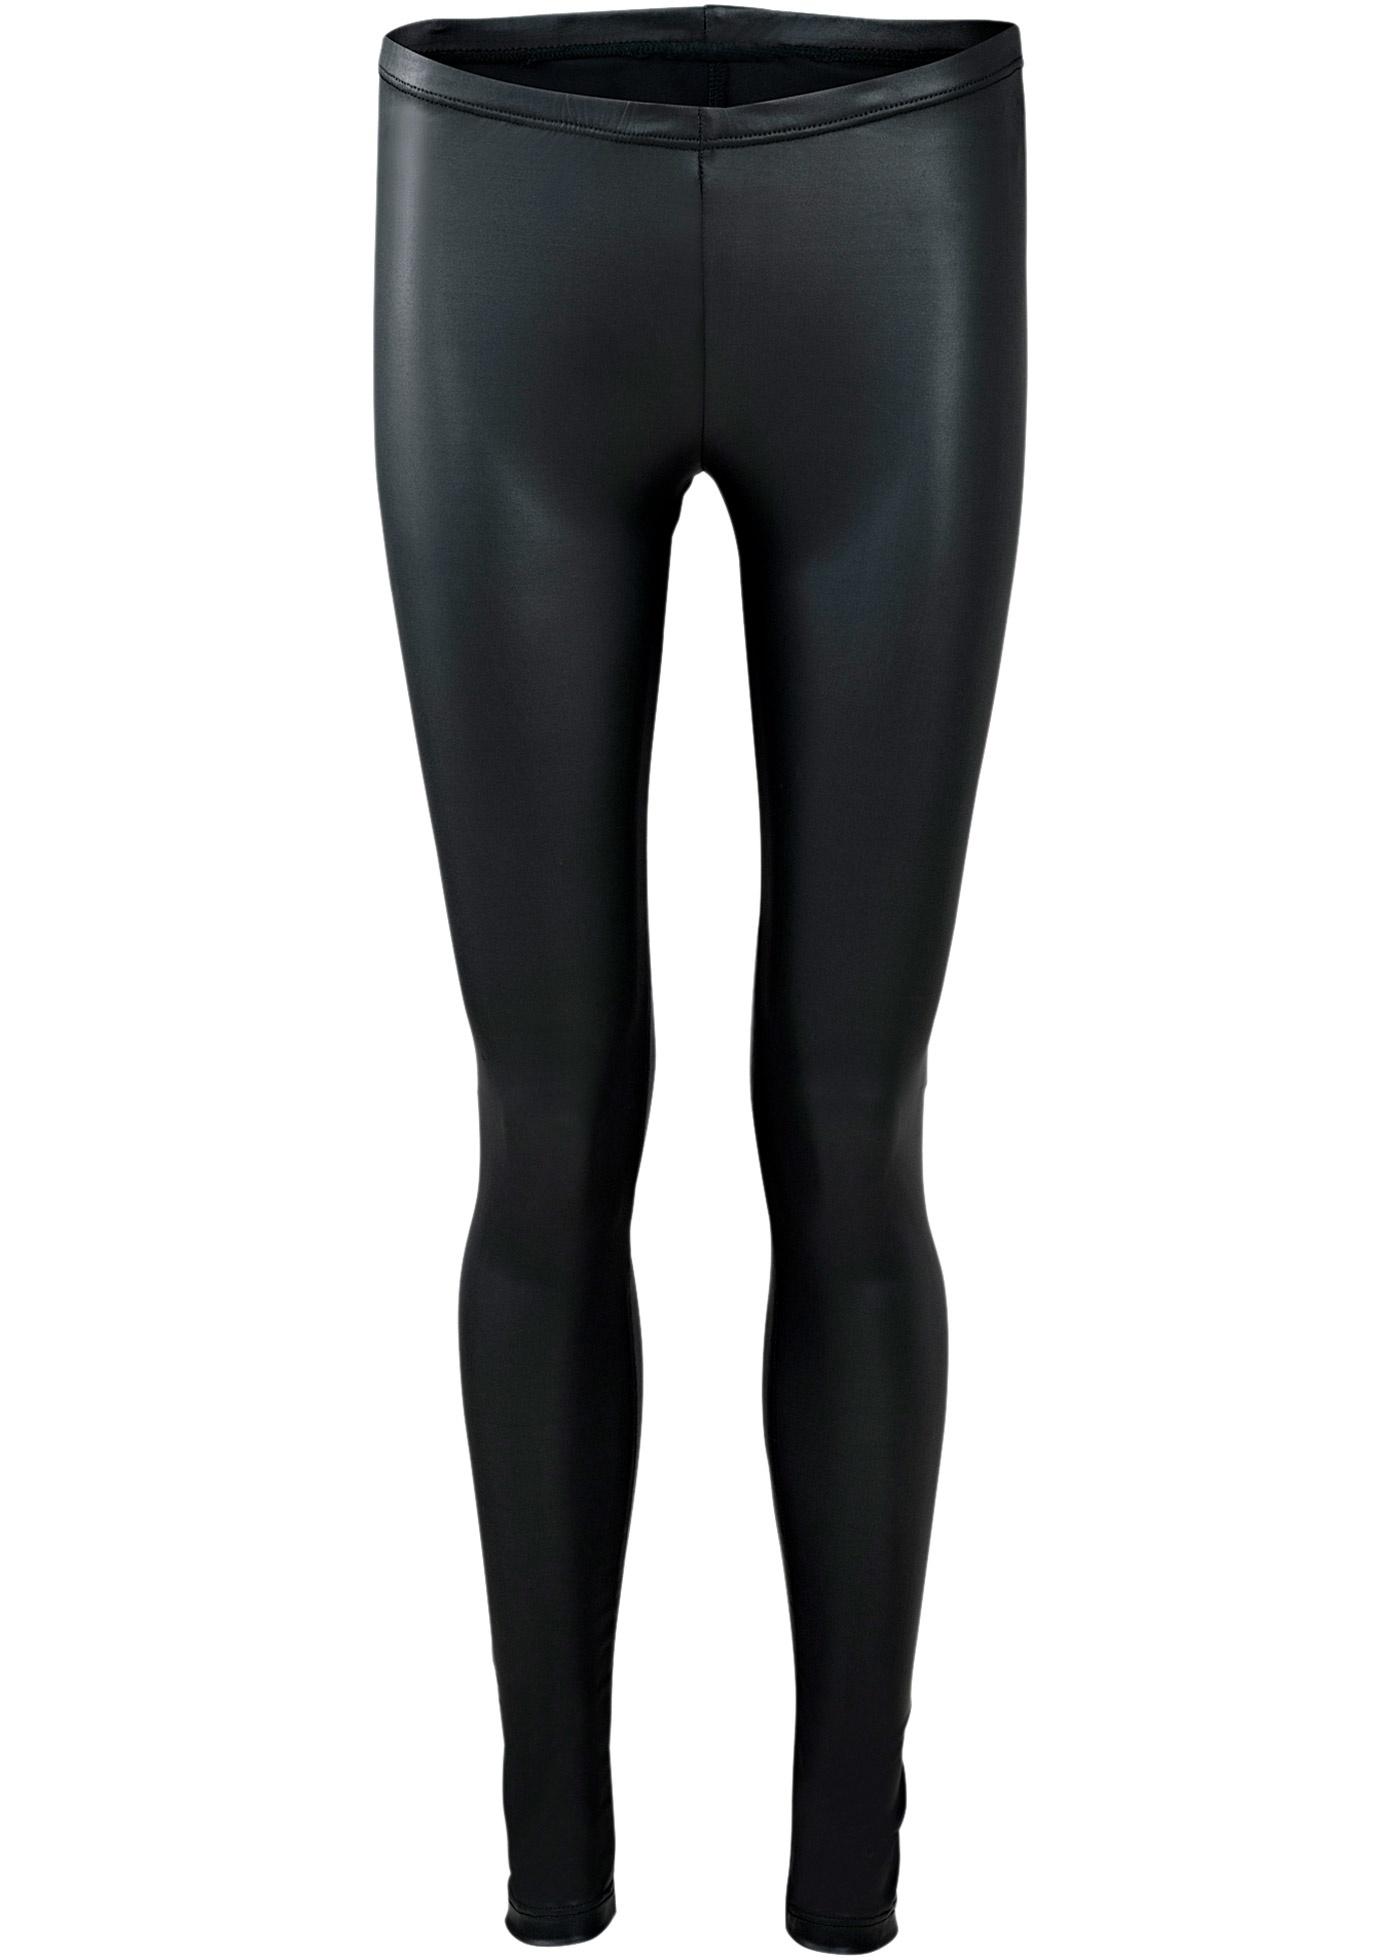 Femme BonprixLegging Bodyflirt Pour Enduit Noir Yfv7gb6y